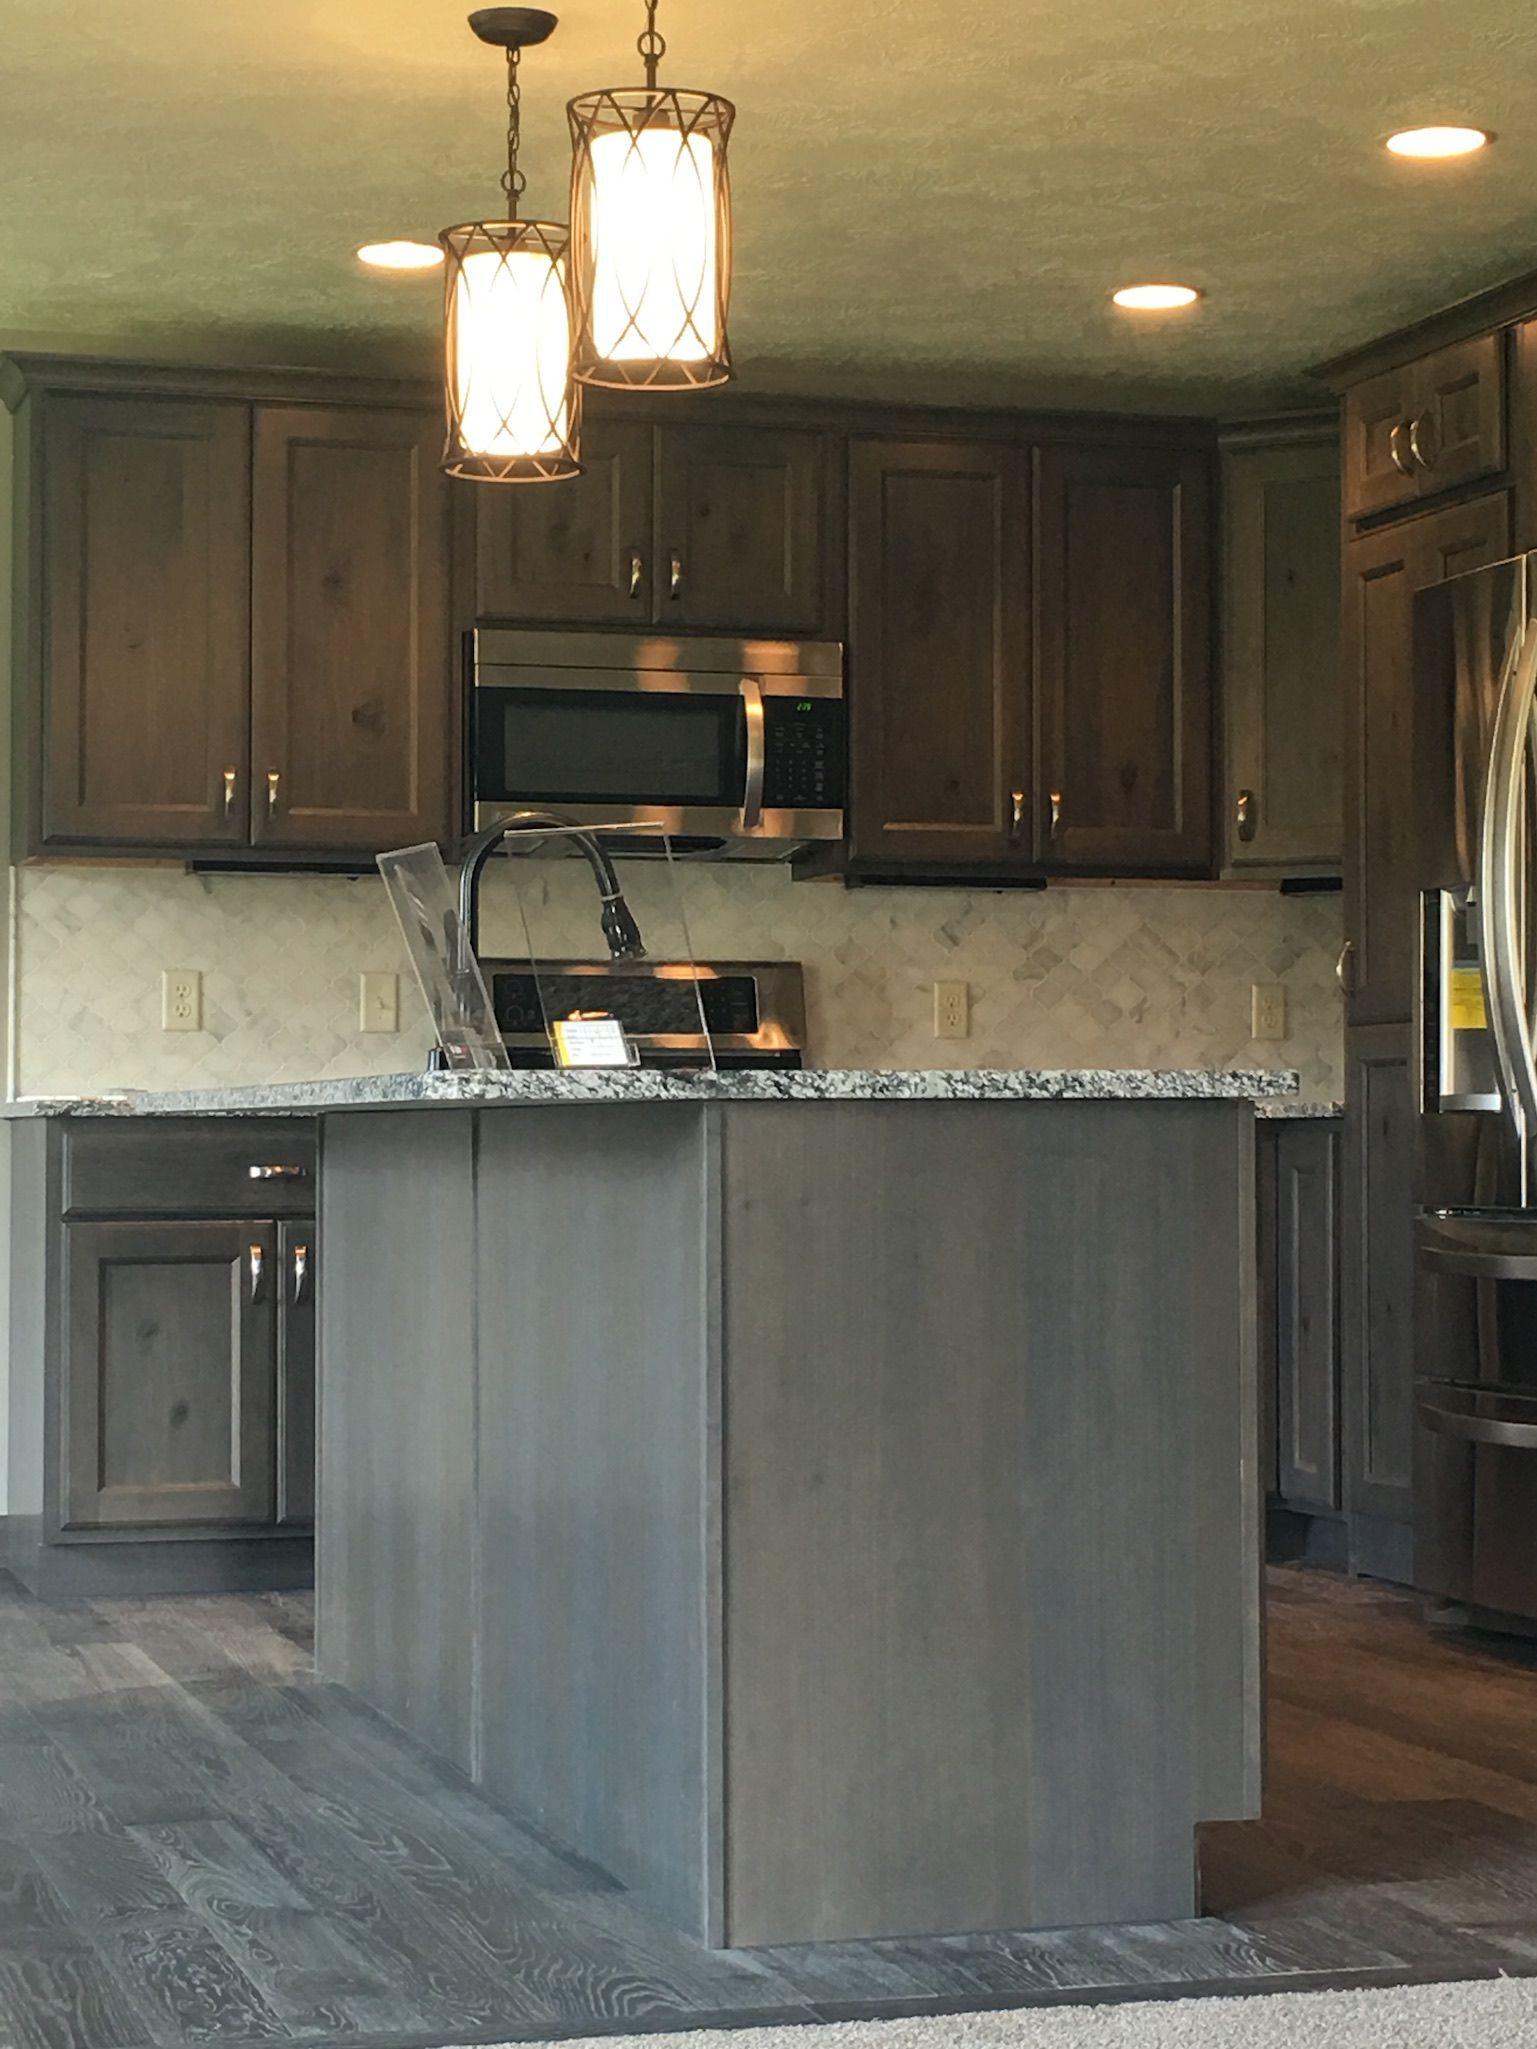 "white marble kitchen backsplash. 3"" arabesque lantern inset above"